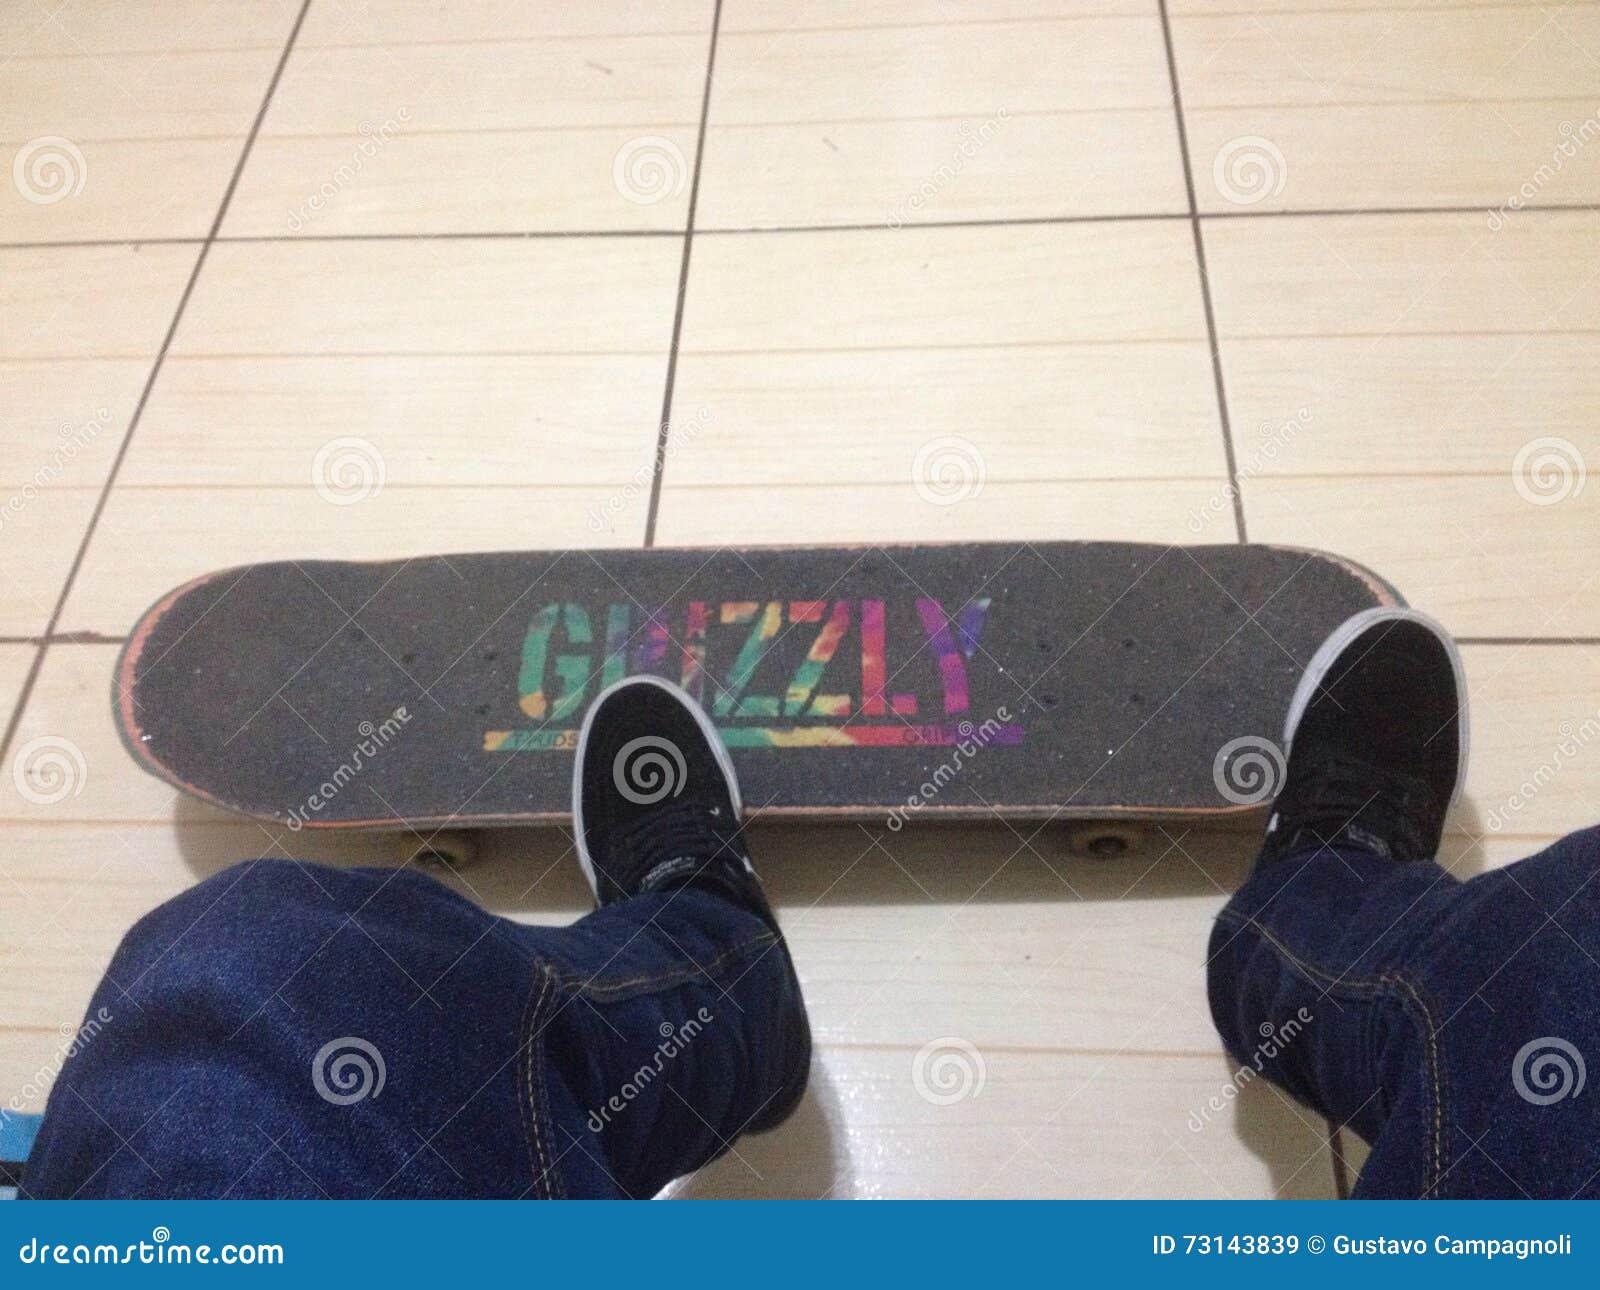 Grizzly grip Skateboard